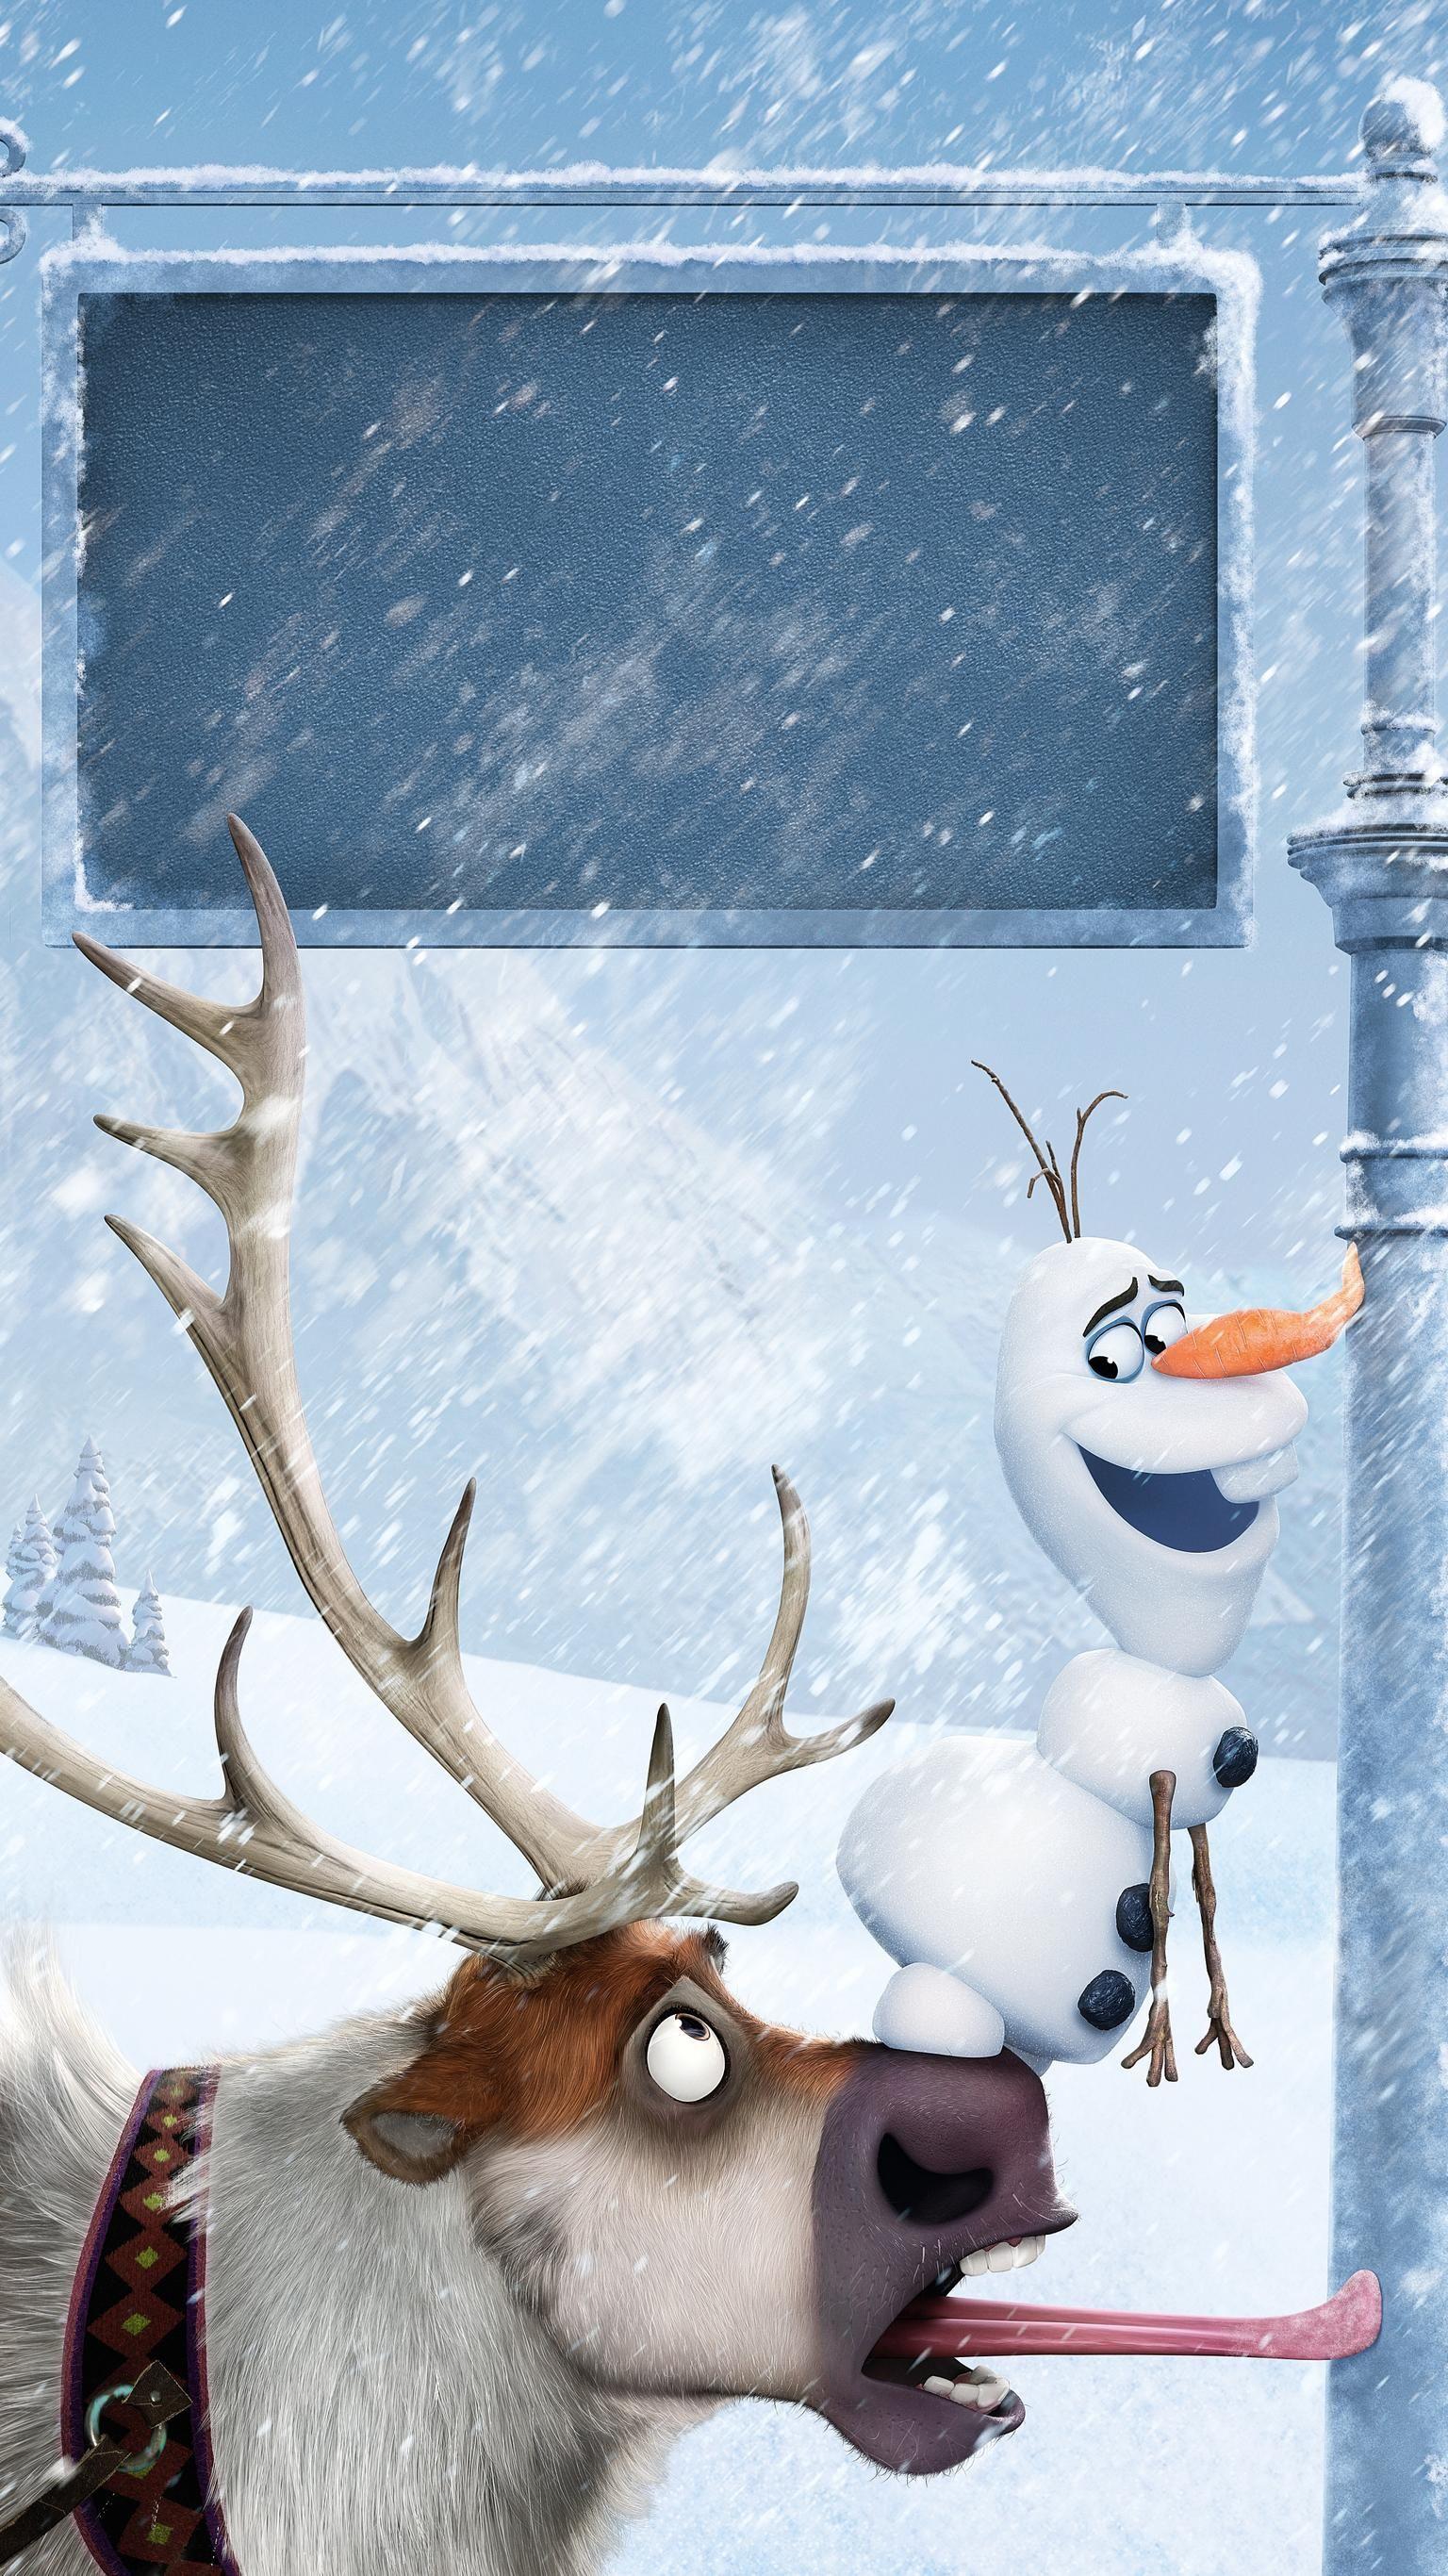 Photo of Frozen (2013) Telefon Wallpaper | Moviemania